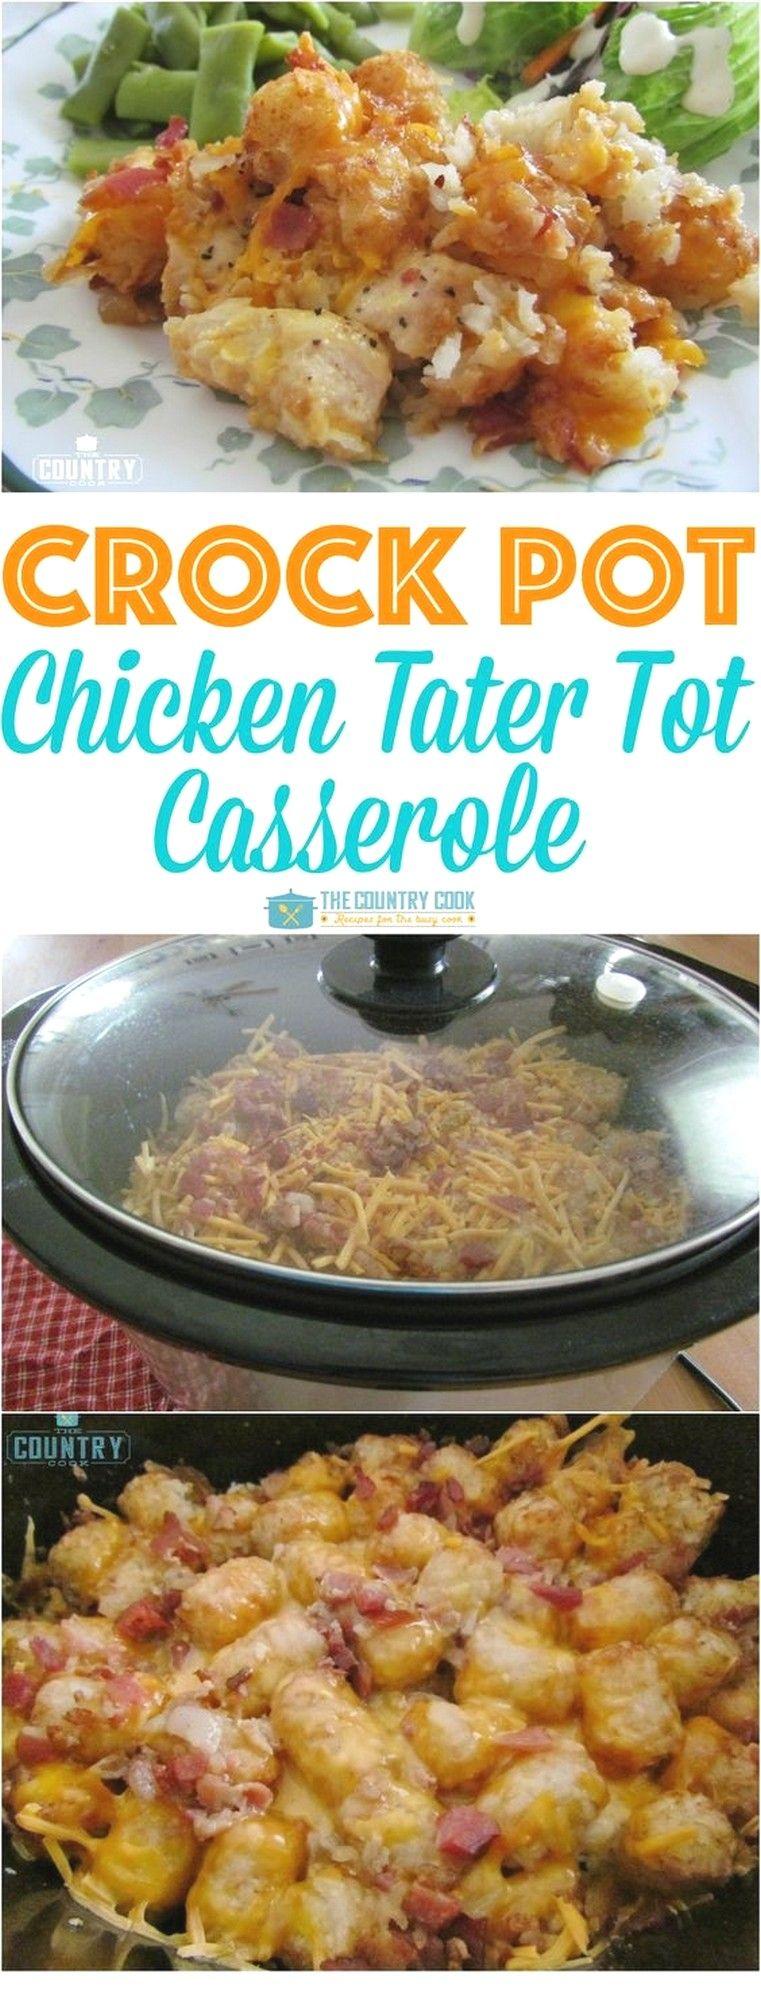 Crock Pot Cheesy Chicken Tater Tot Casserole | Crockpot Recipes #healthycrockpotchickenrecipes